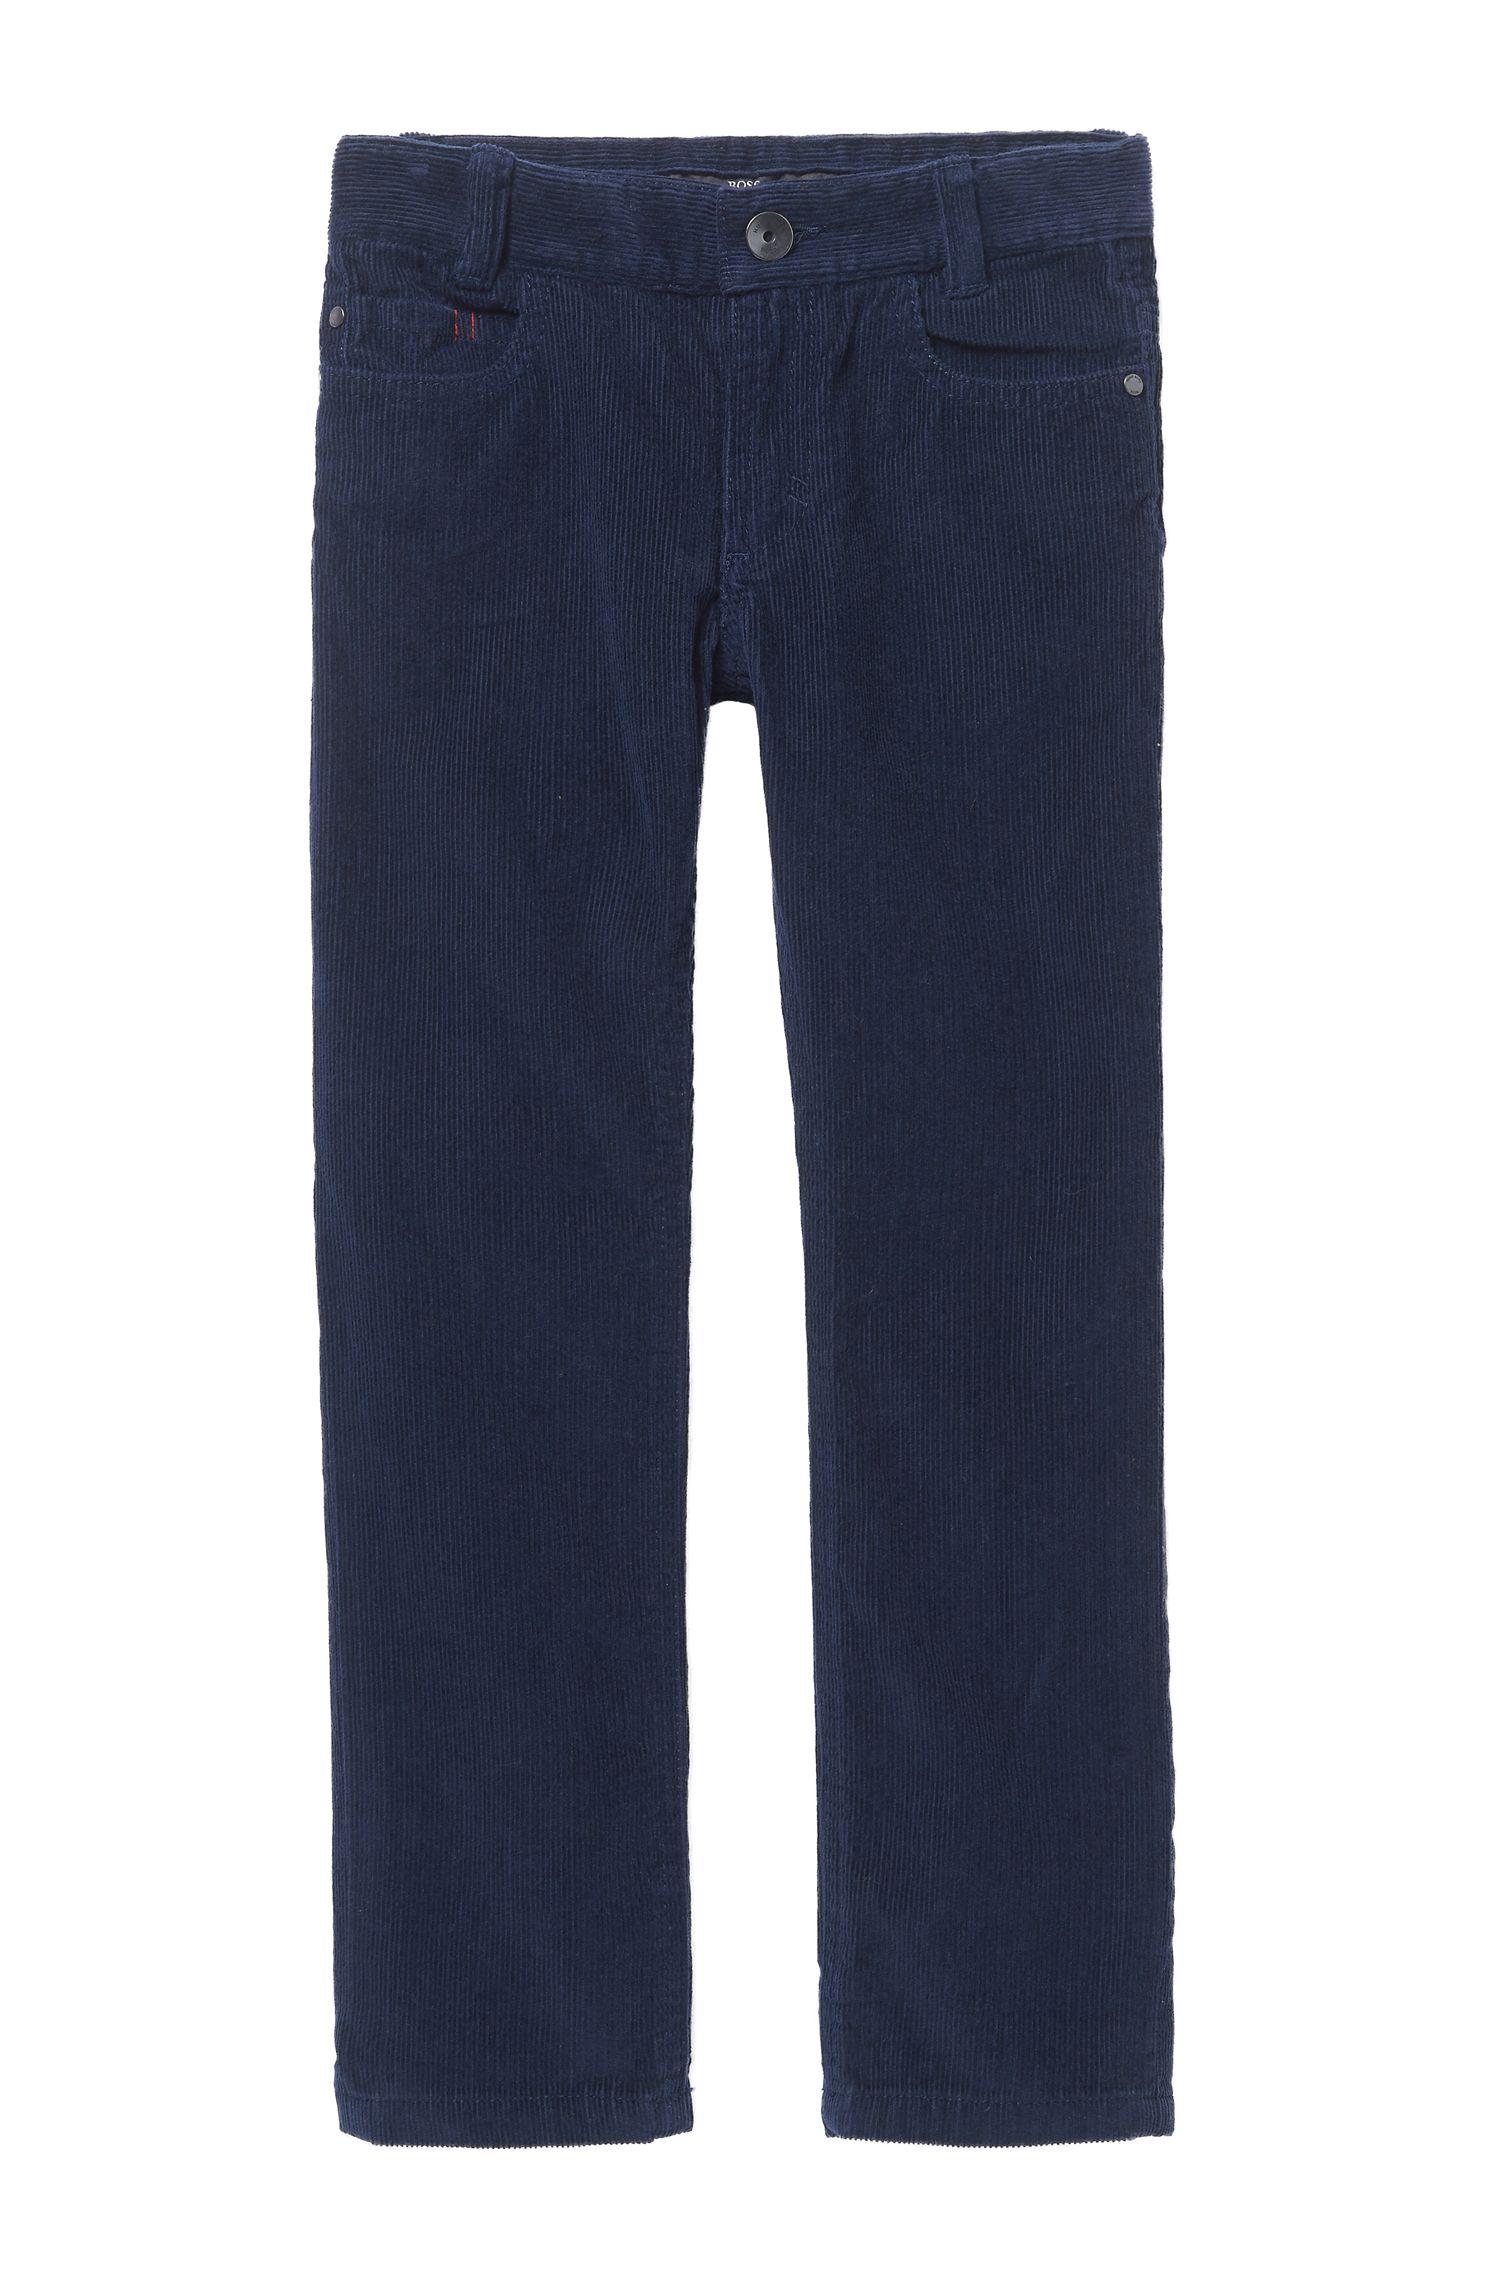 'J24419' | Boys Stretch Cotton Corduroy Trousers, Dark Blue